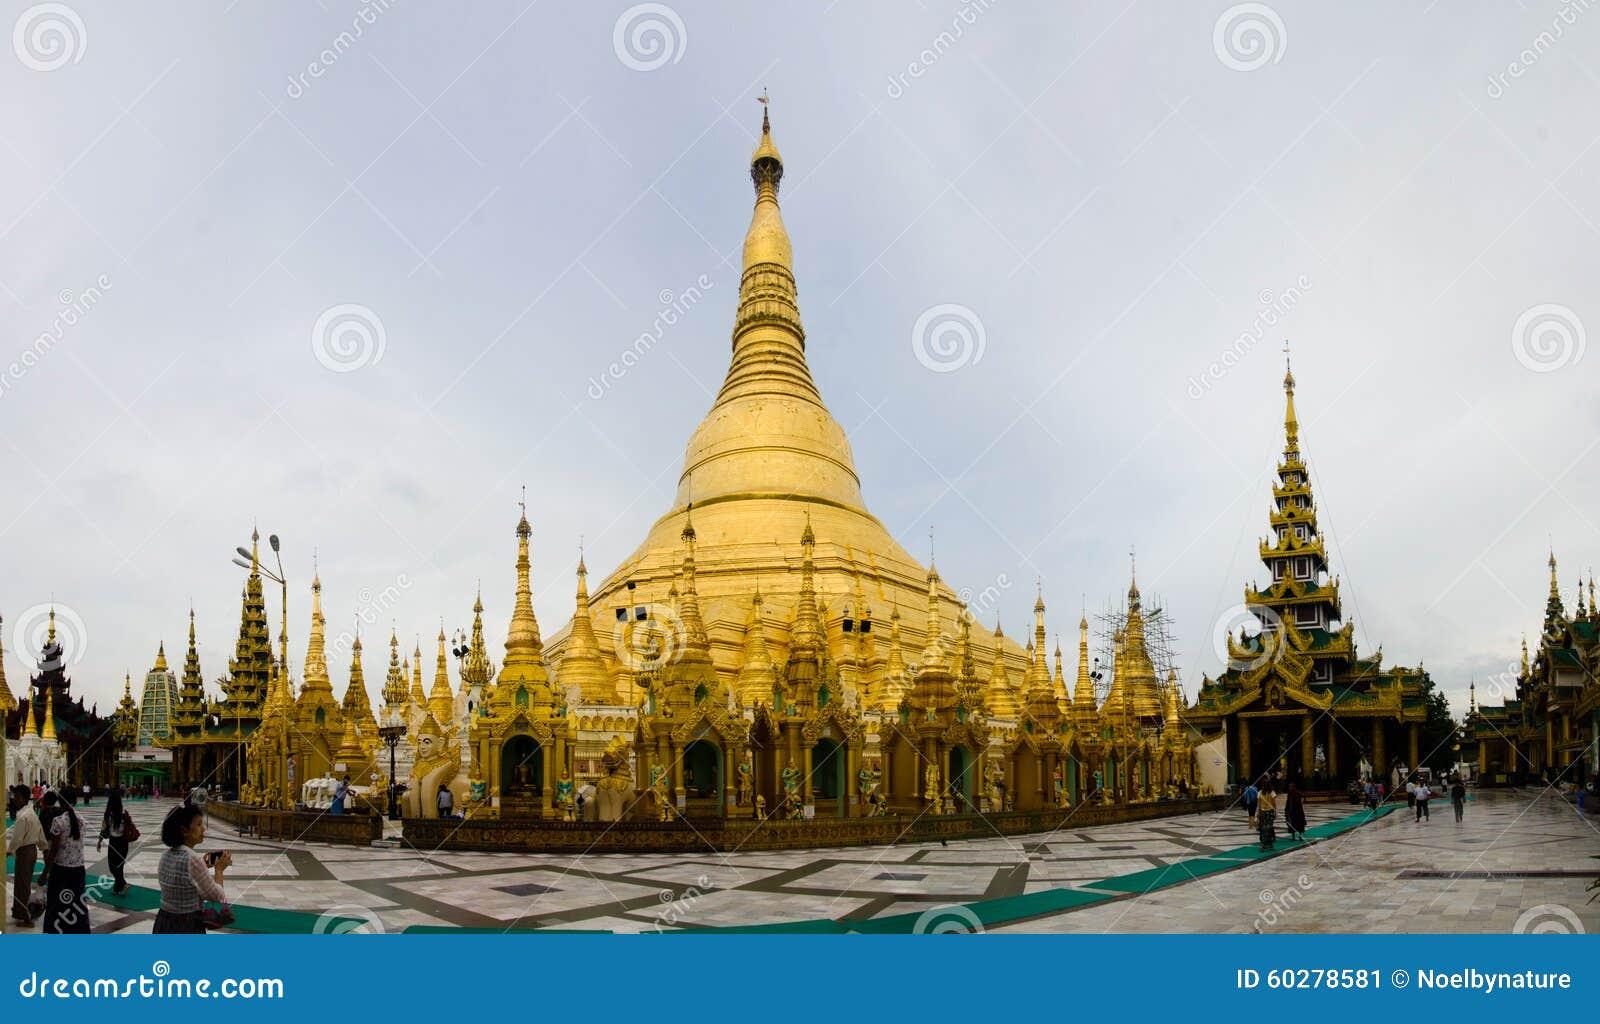 Shwedagon Pagoda Editorial Photo Image 60278581